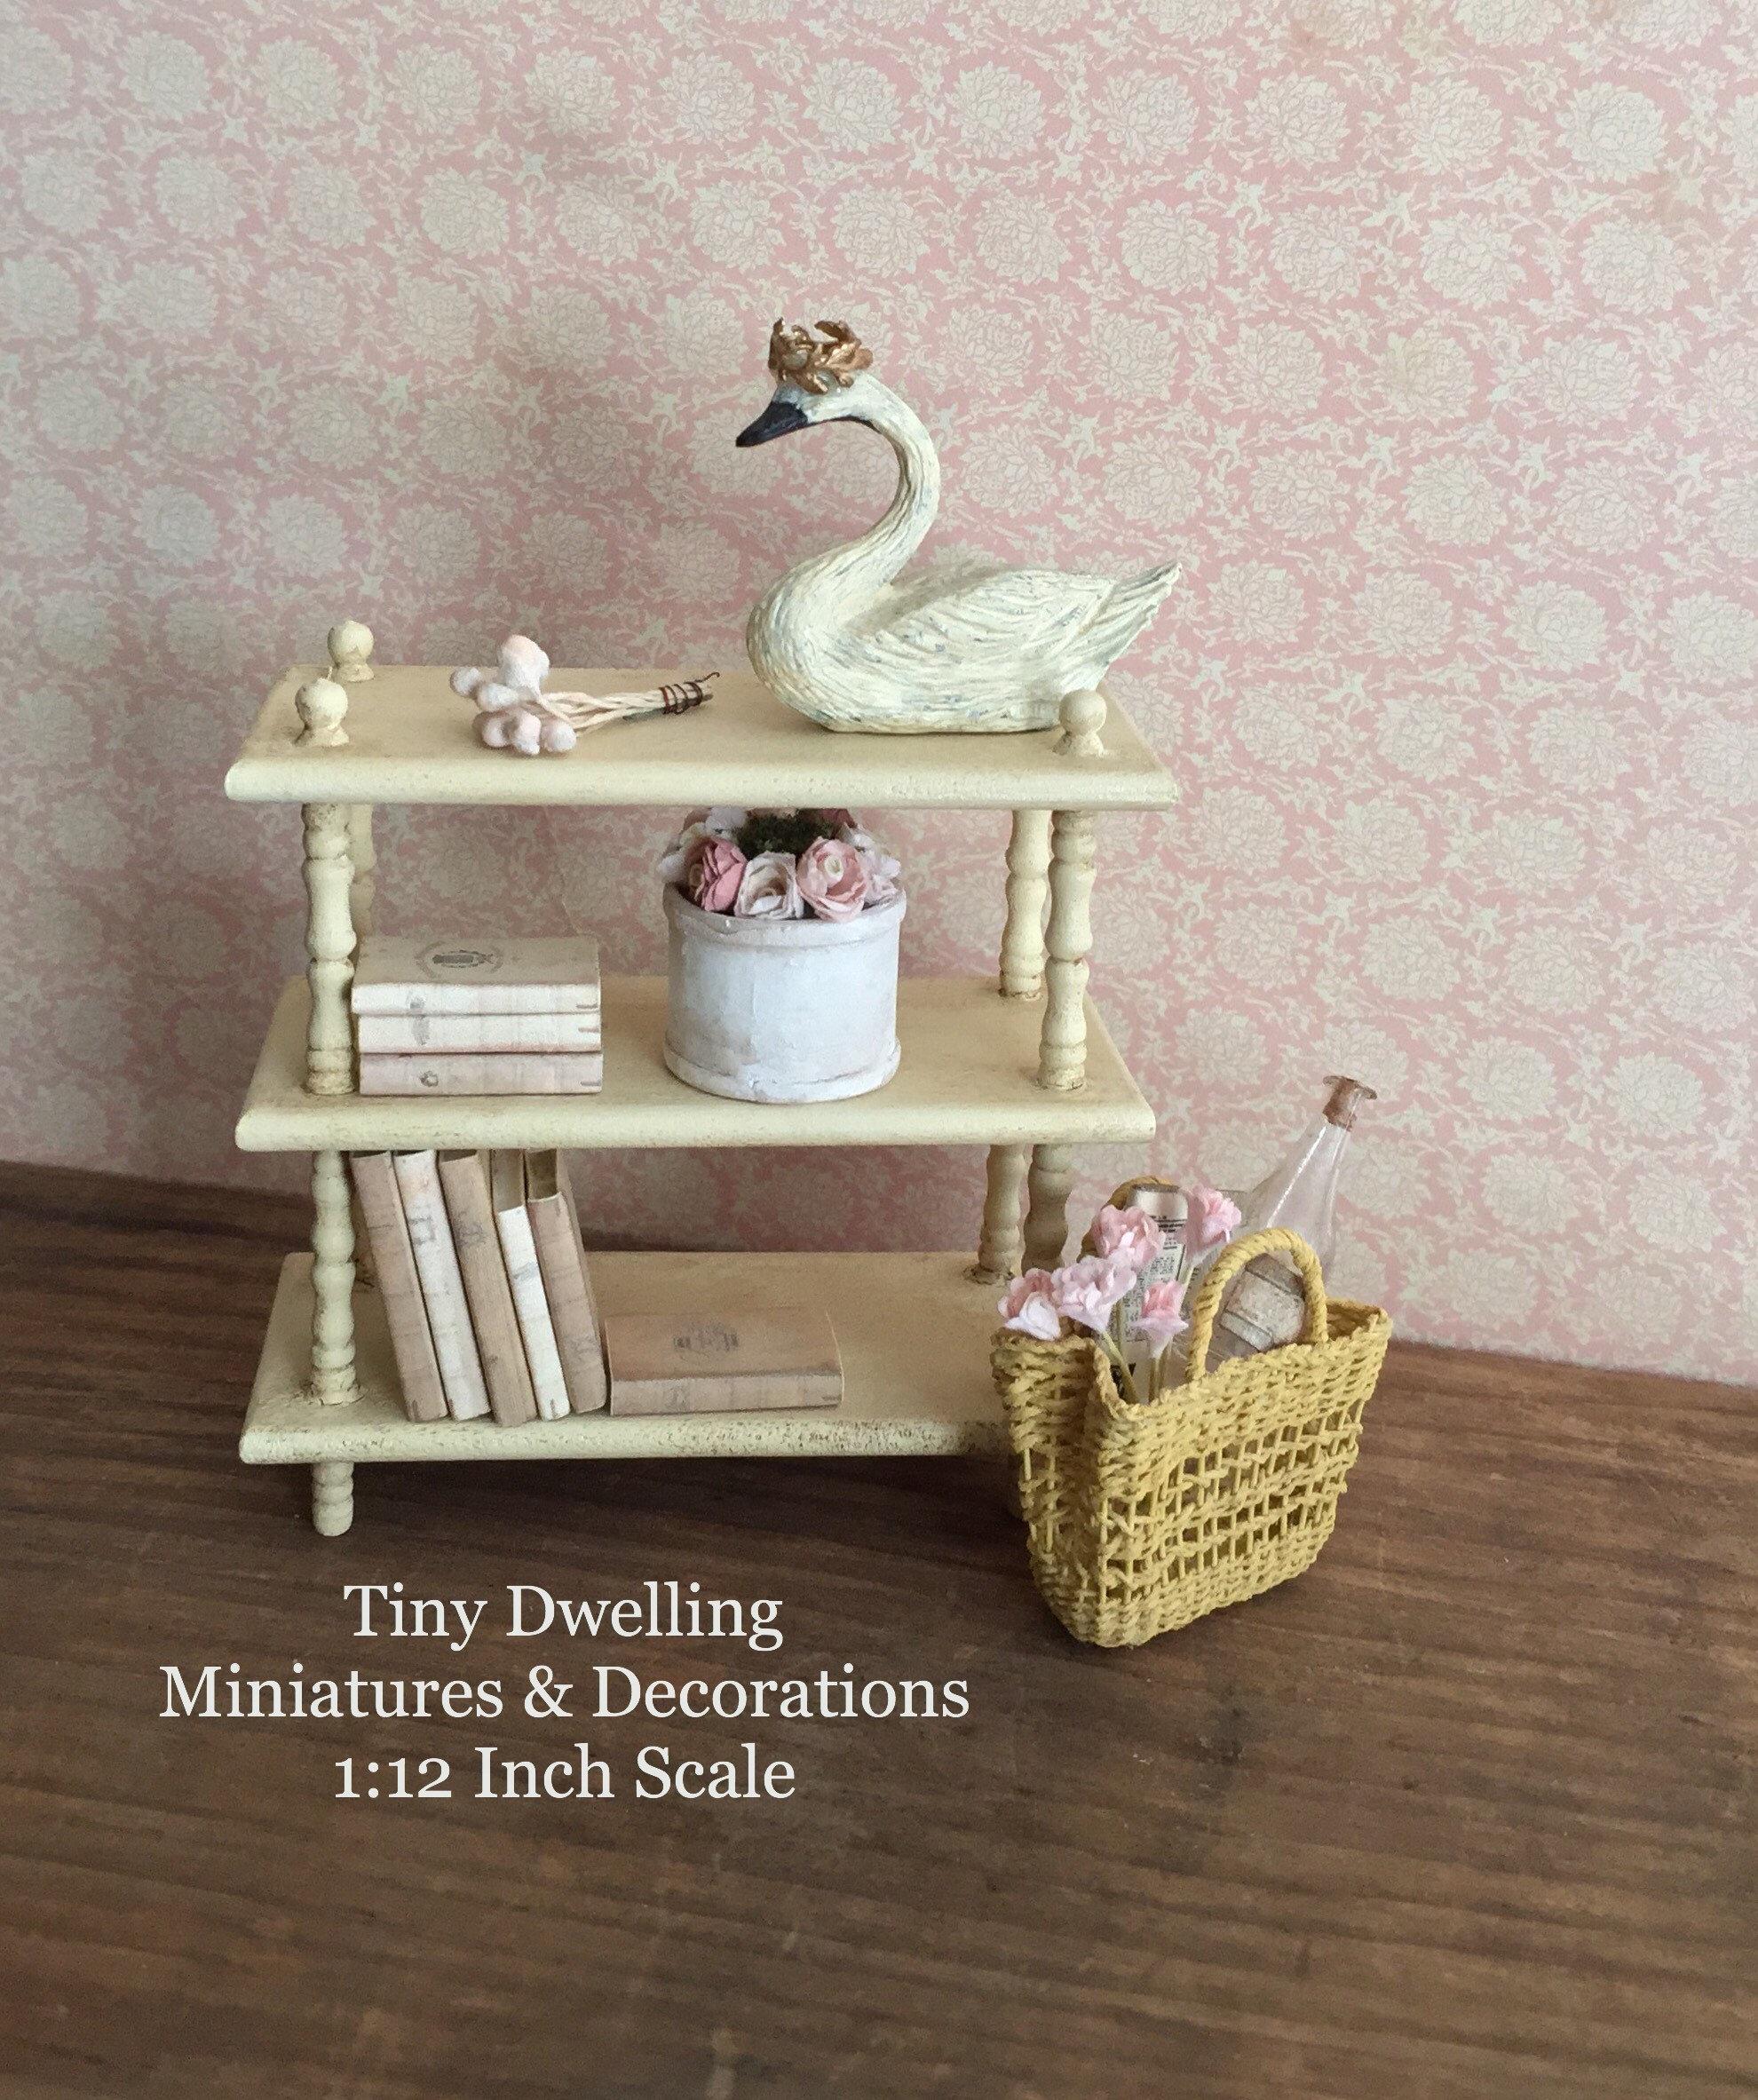 Miniature Bookcase Miniature Shelving Miniature Furniture French Country Miniatures Miniature Book Shelf